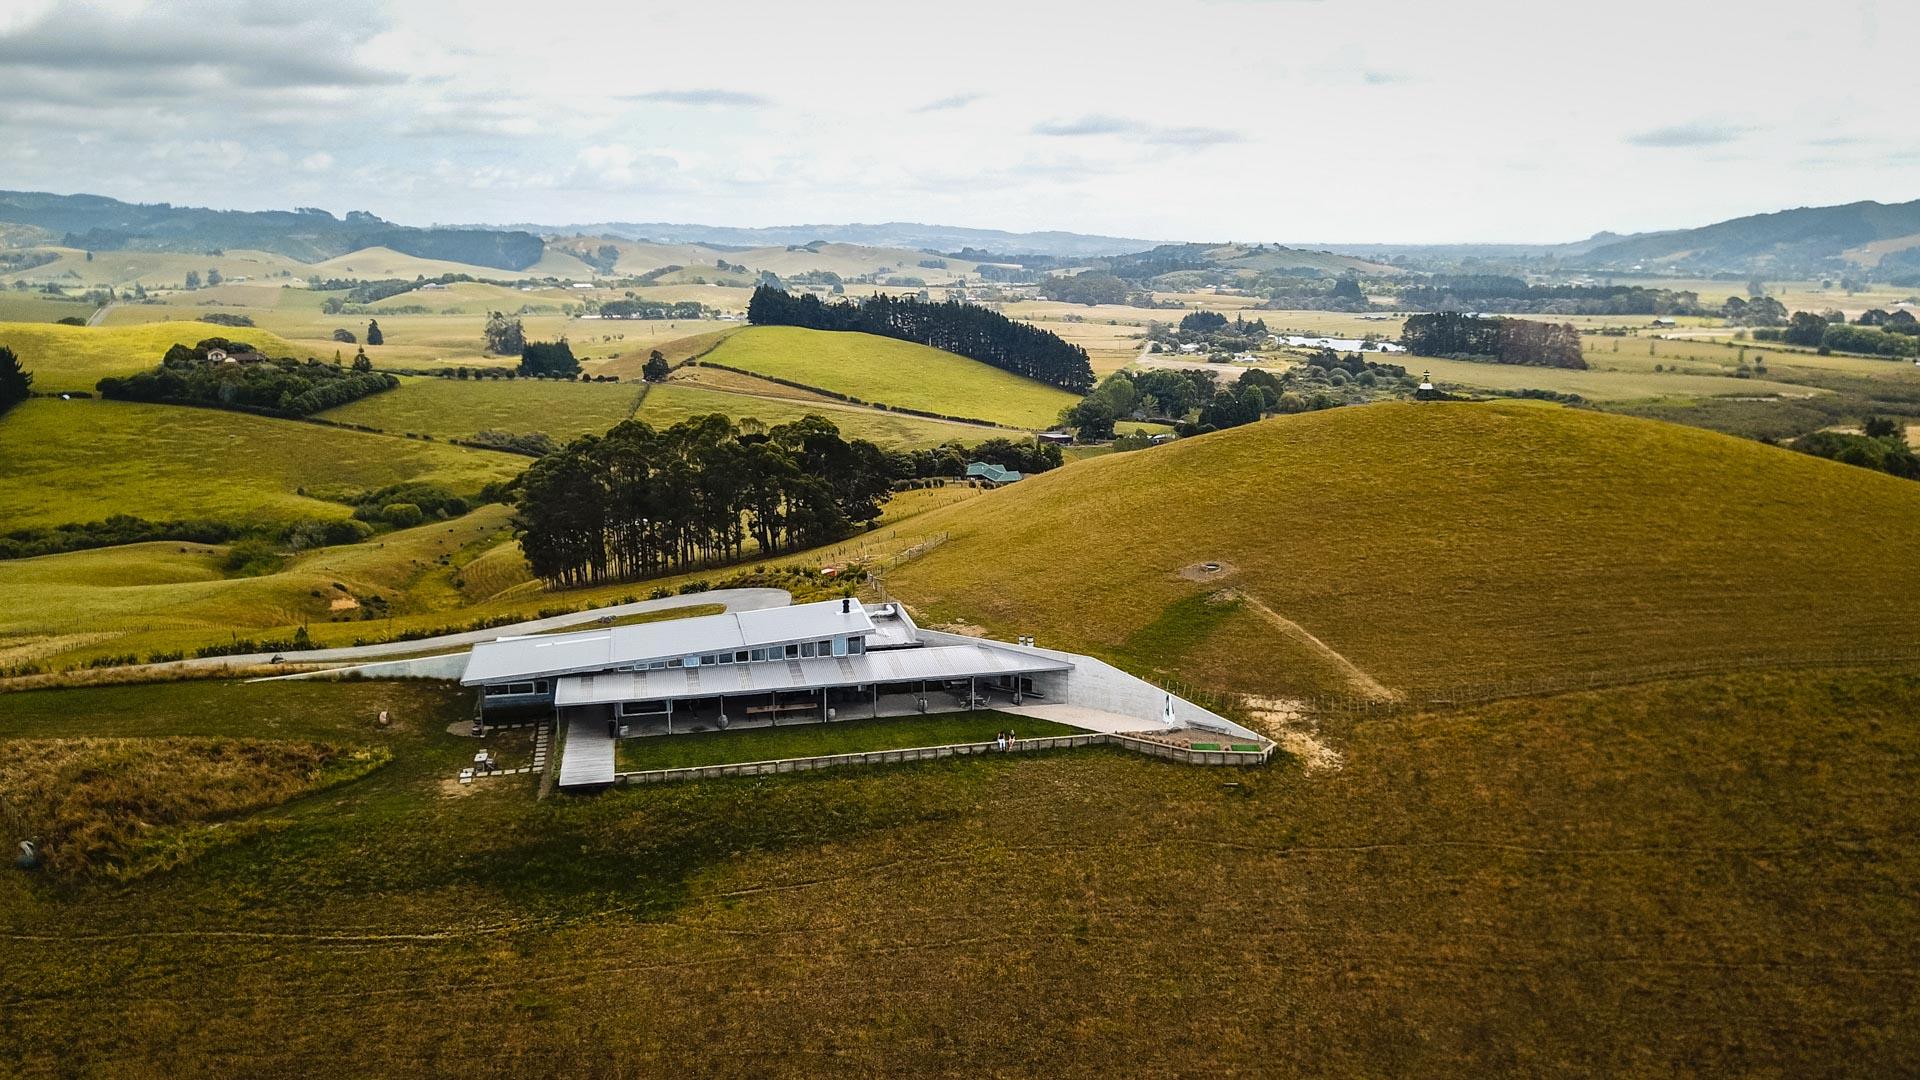 Drone Photography | up+up | Real Estate Kauri Bay Boomrock 2-web.jpg